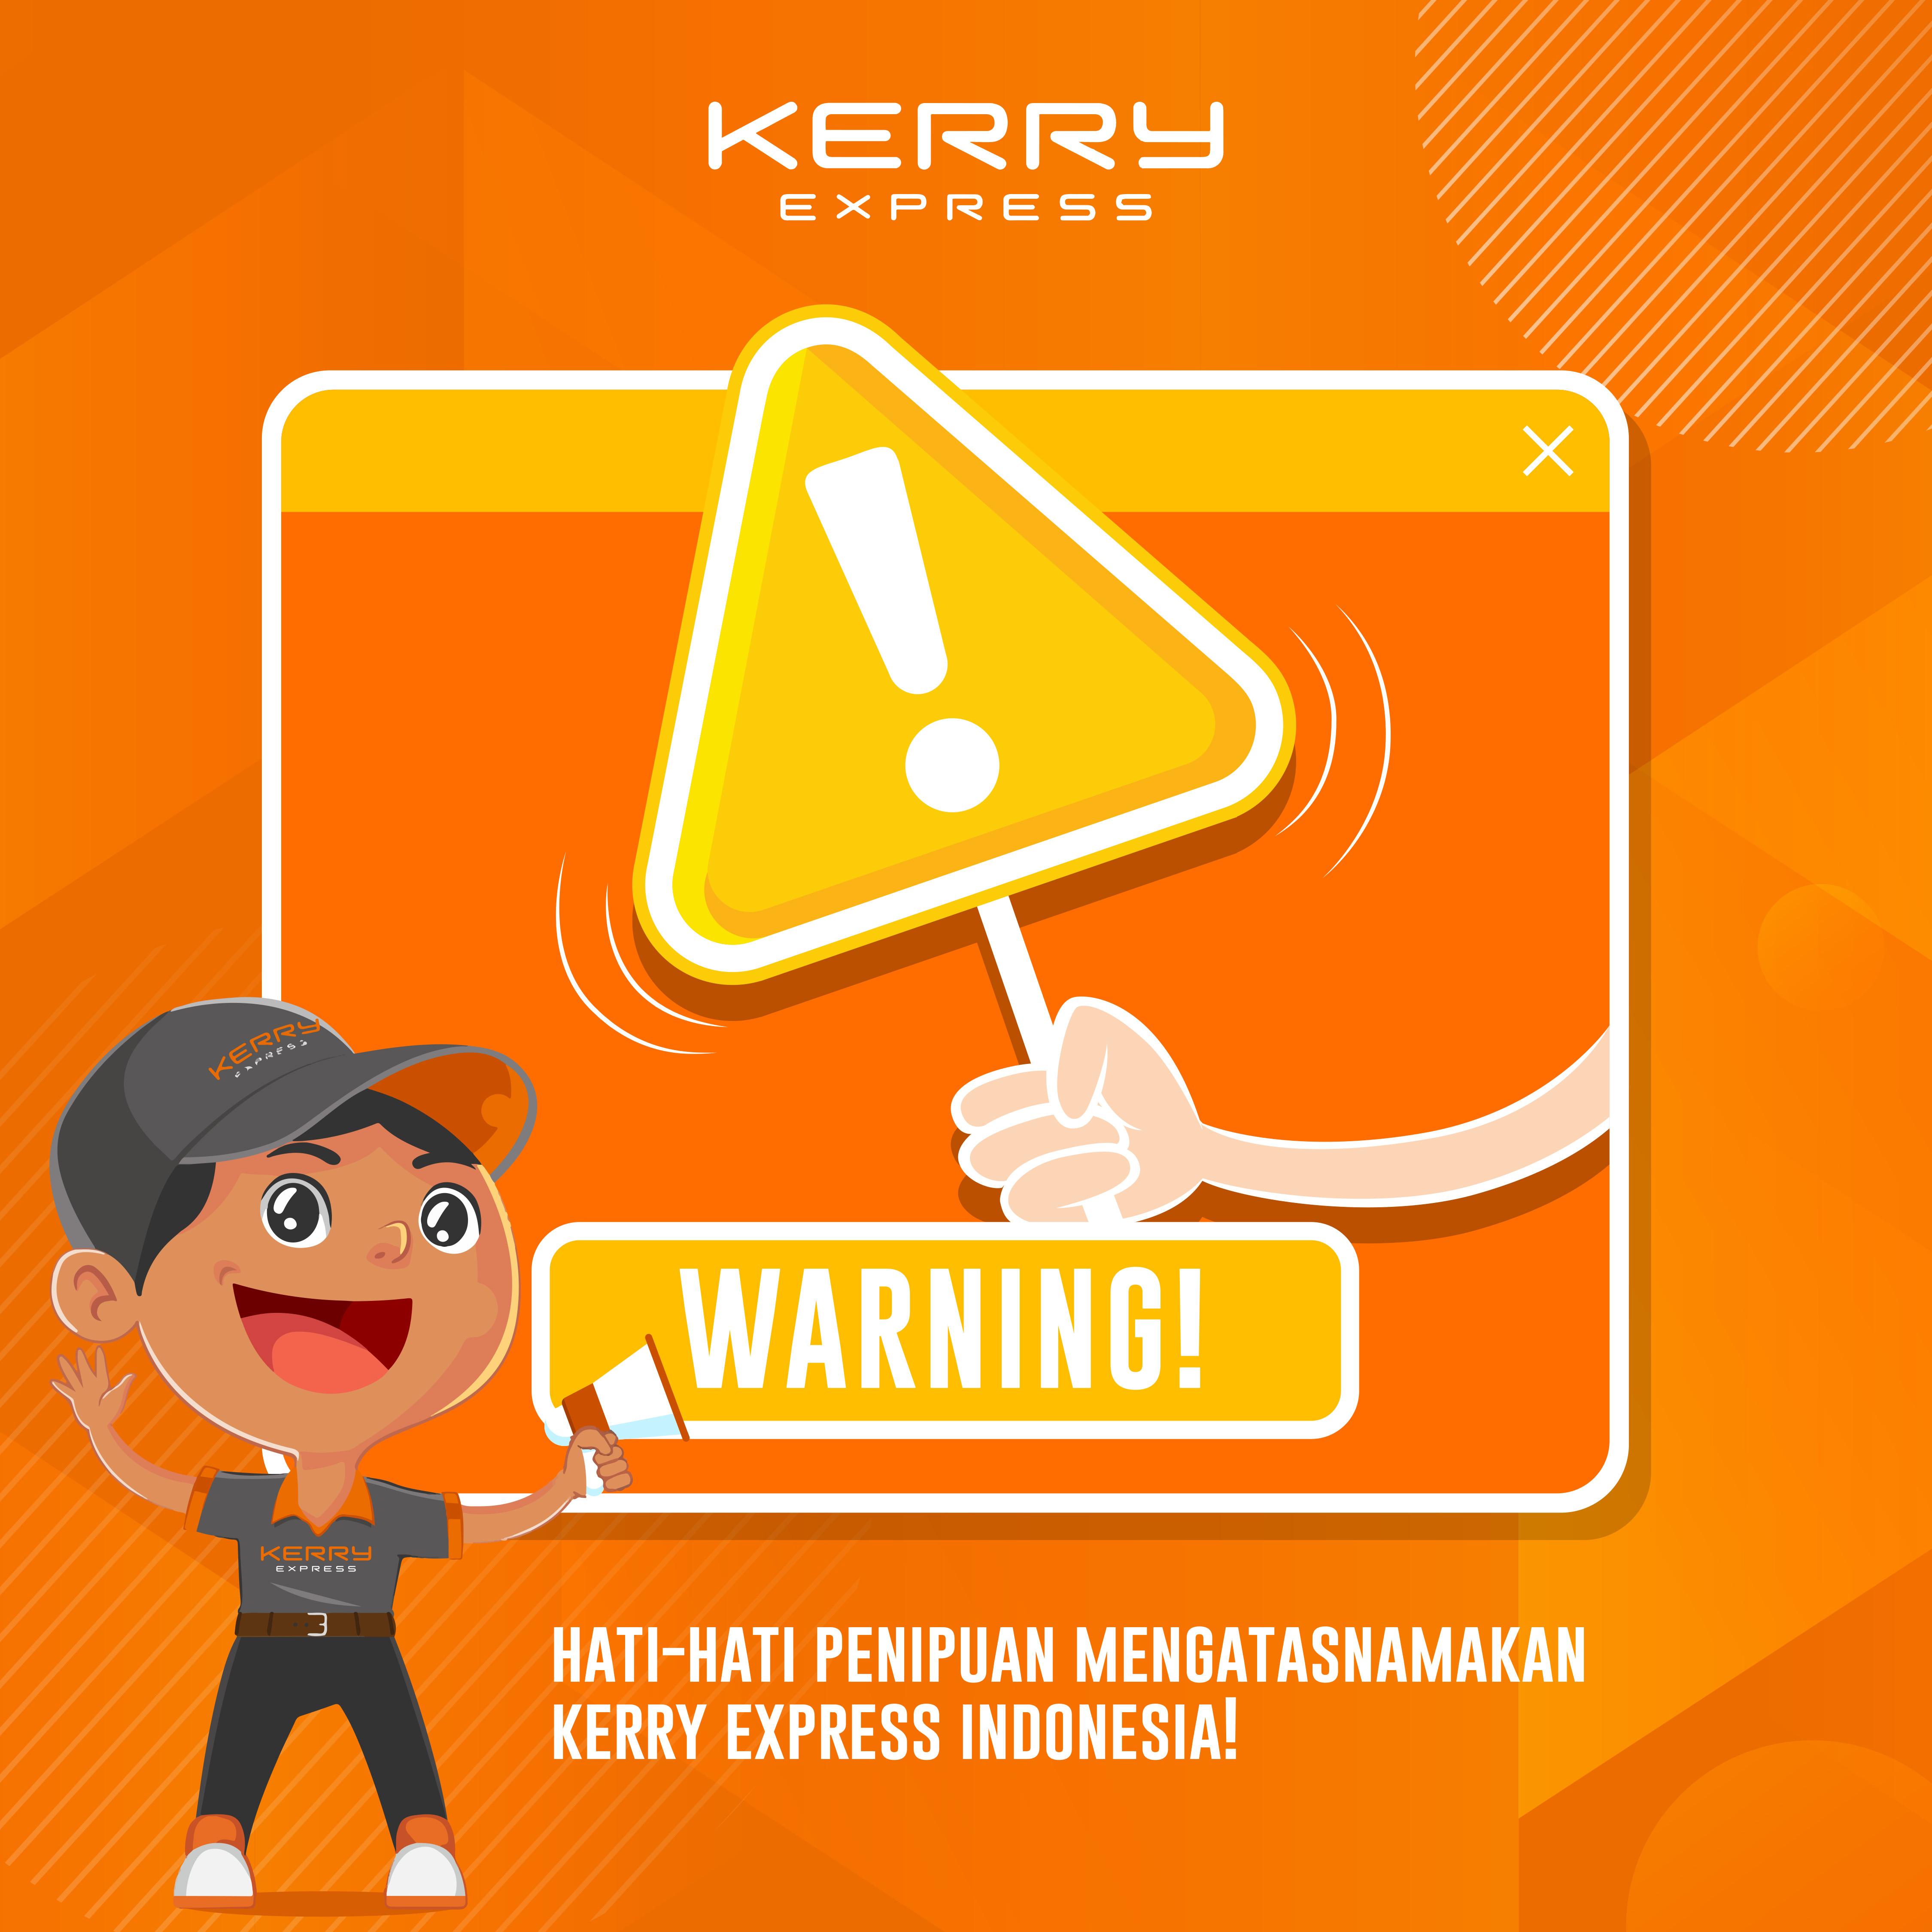 Hati Hati Penipuan Kerry Express Indonesia